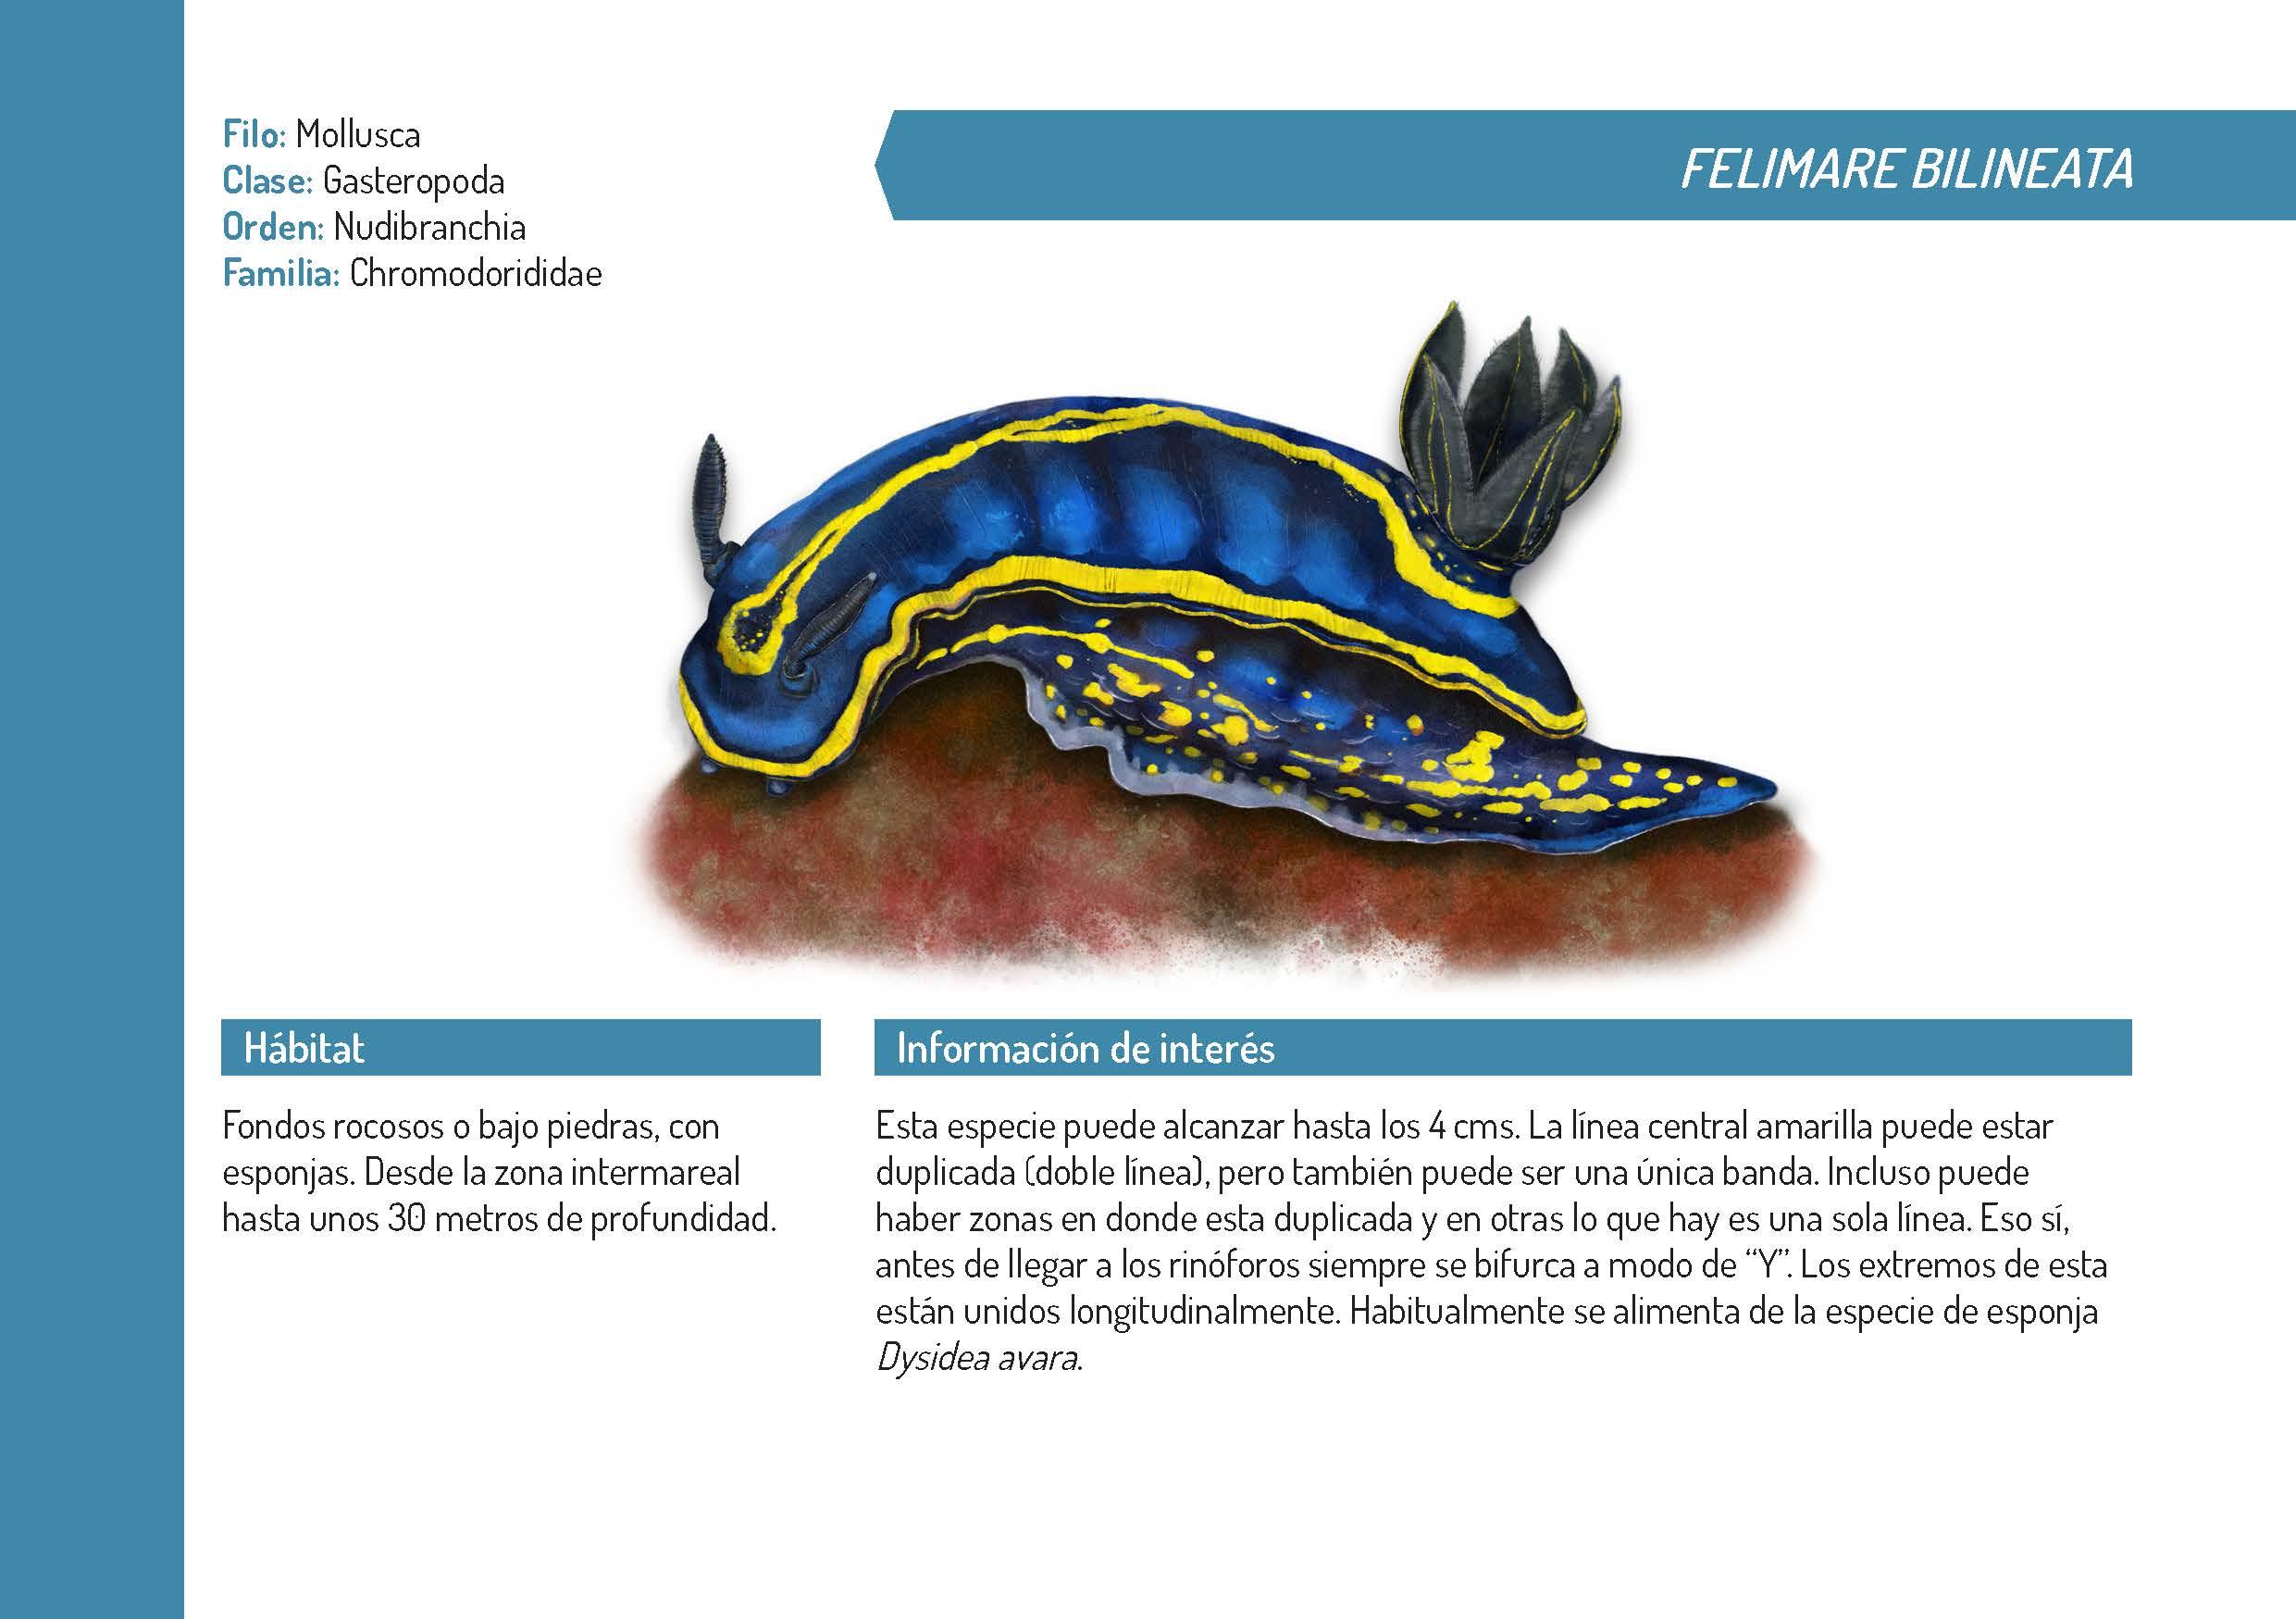 Illustrations owned by Vanessa González Ortiz: http://vgonzalezortiz.com/en/mi-trabajo/